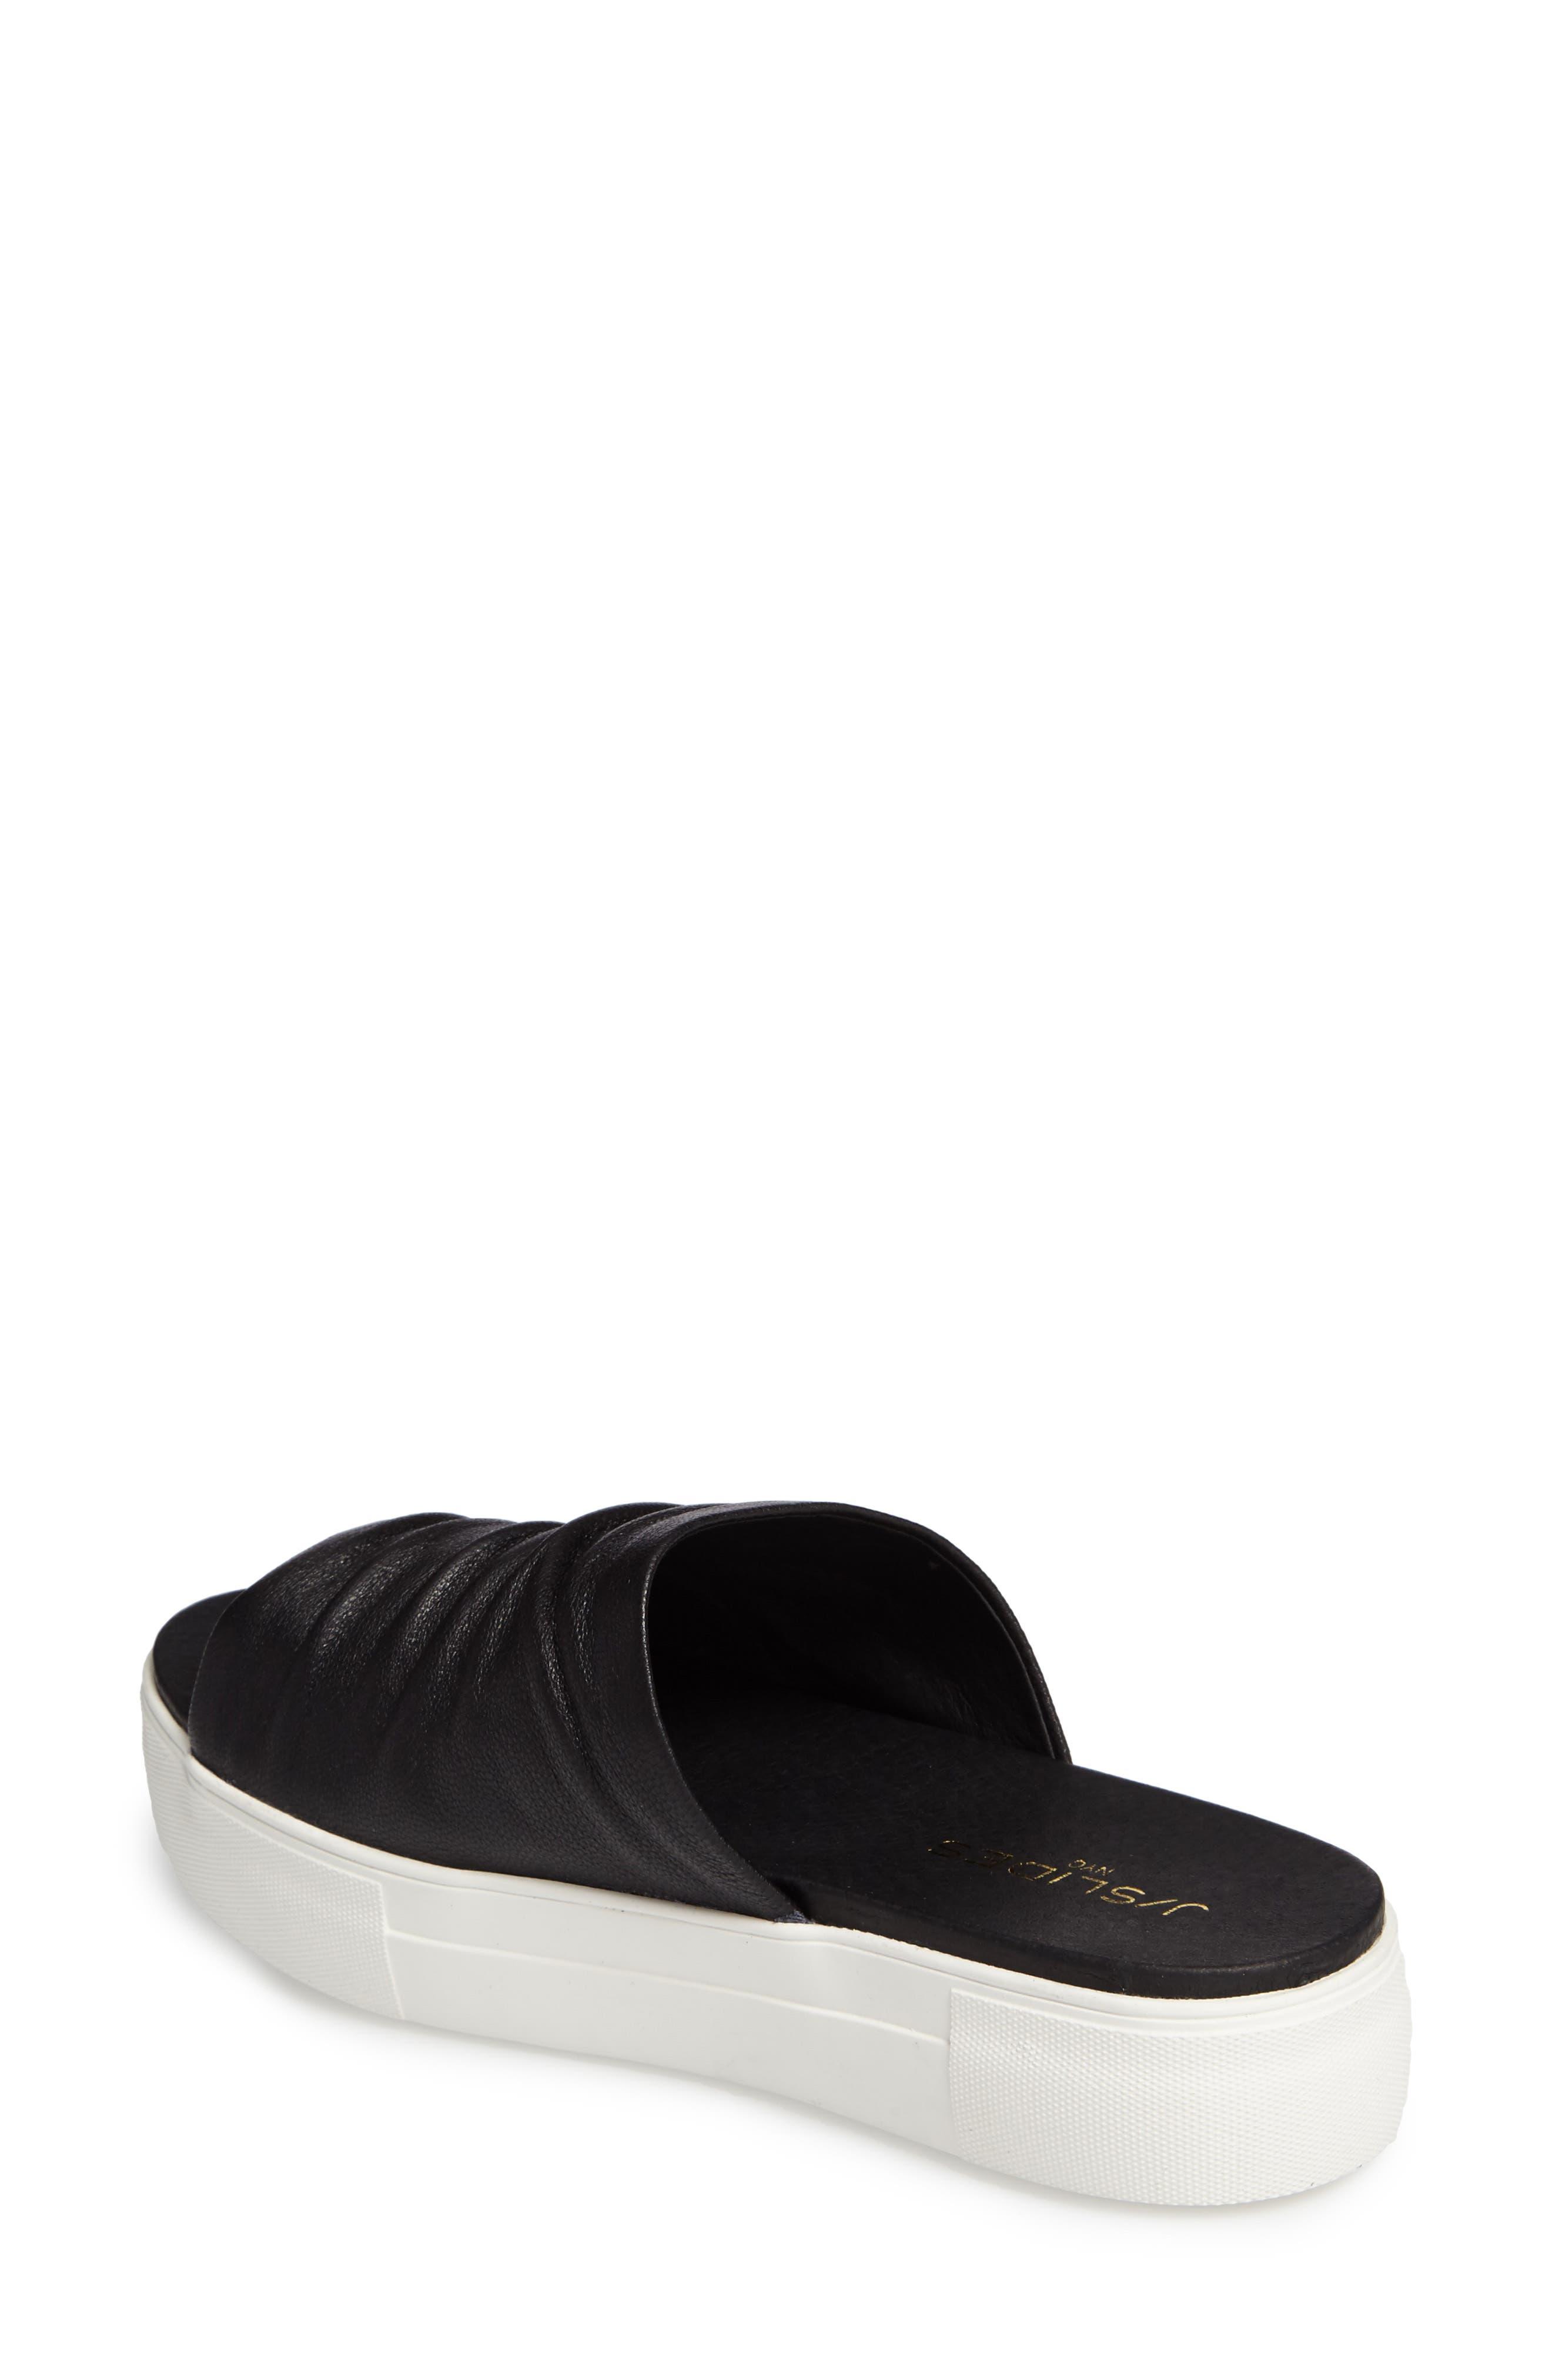 Alura Platform Slide Sandal,                             Alternate thumbnail 3, color,                             Black Leather